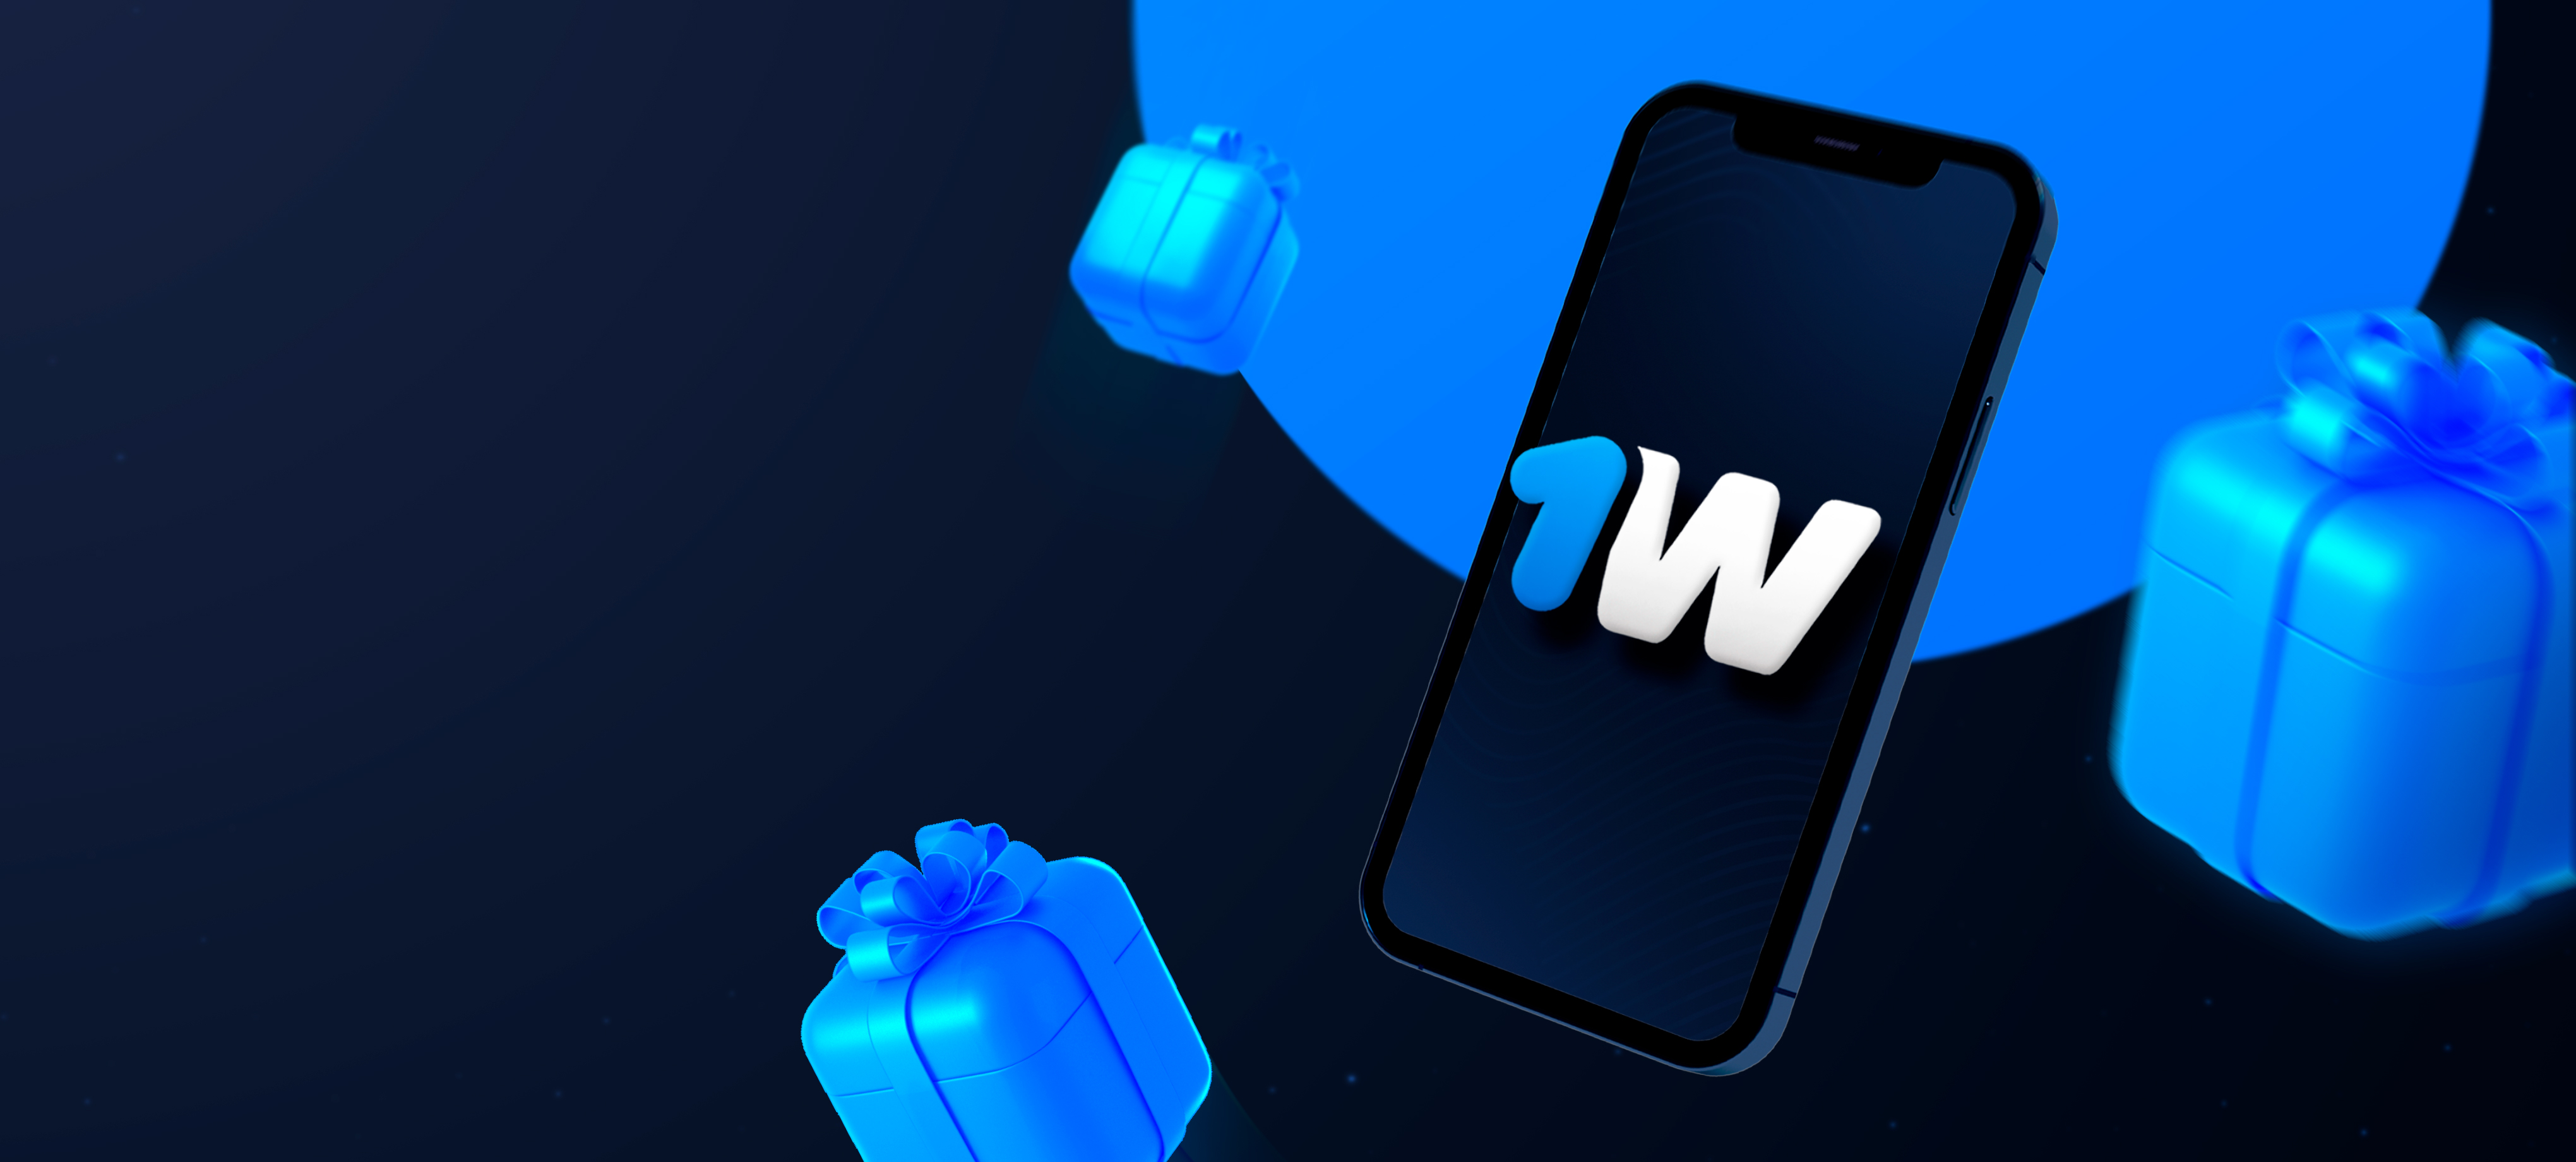 1win обзор и бонус